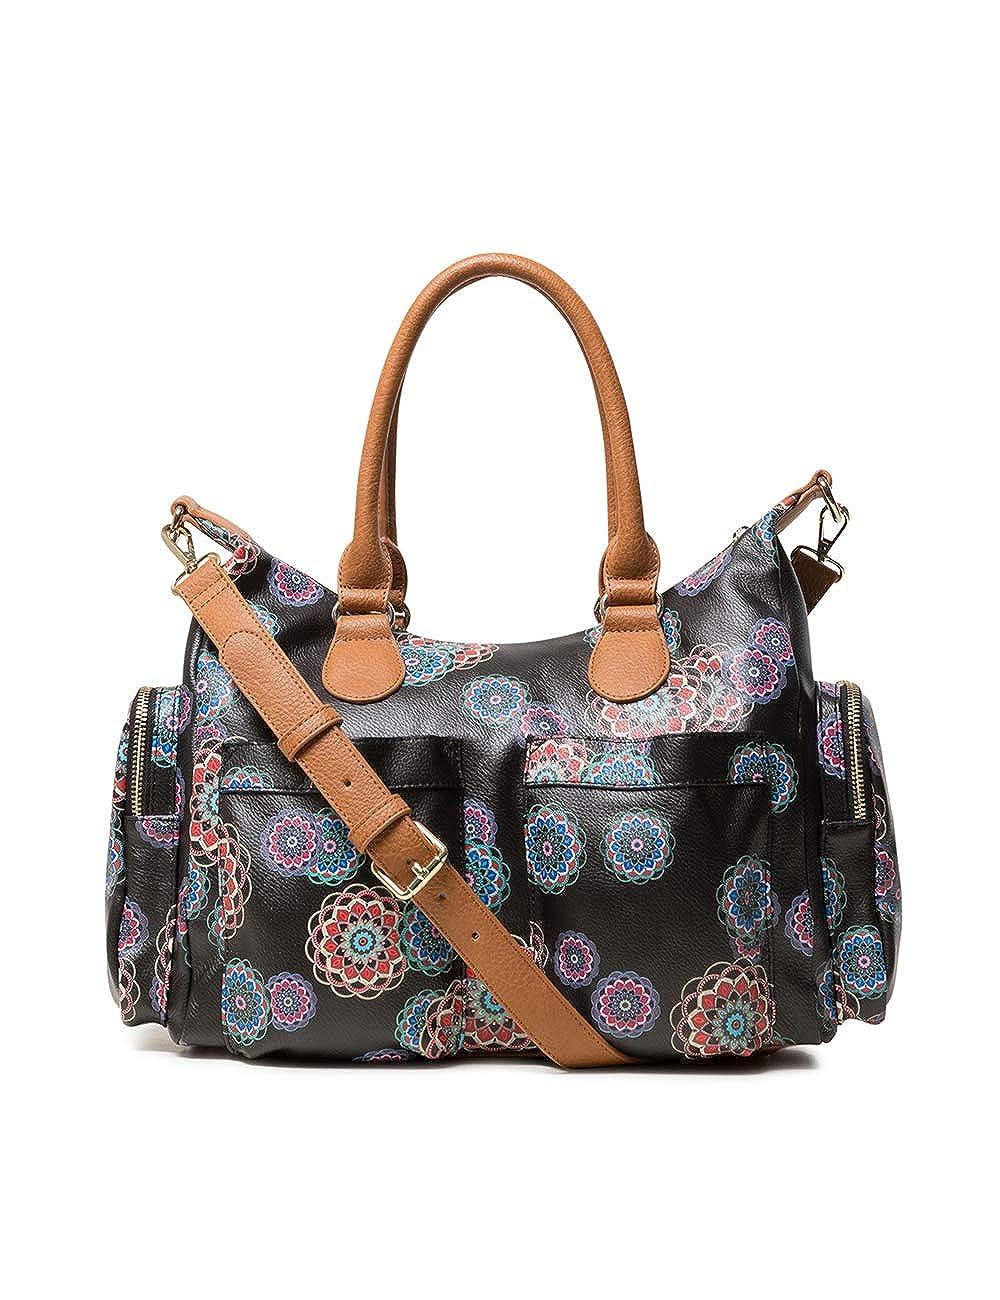 B x H T Negro Noir 15.5x25.5x32 cm Desigual Bag Mandri London Women Sacs port/és /épaule femme